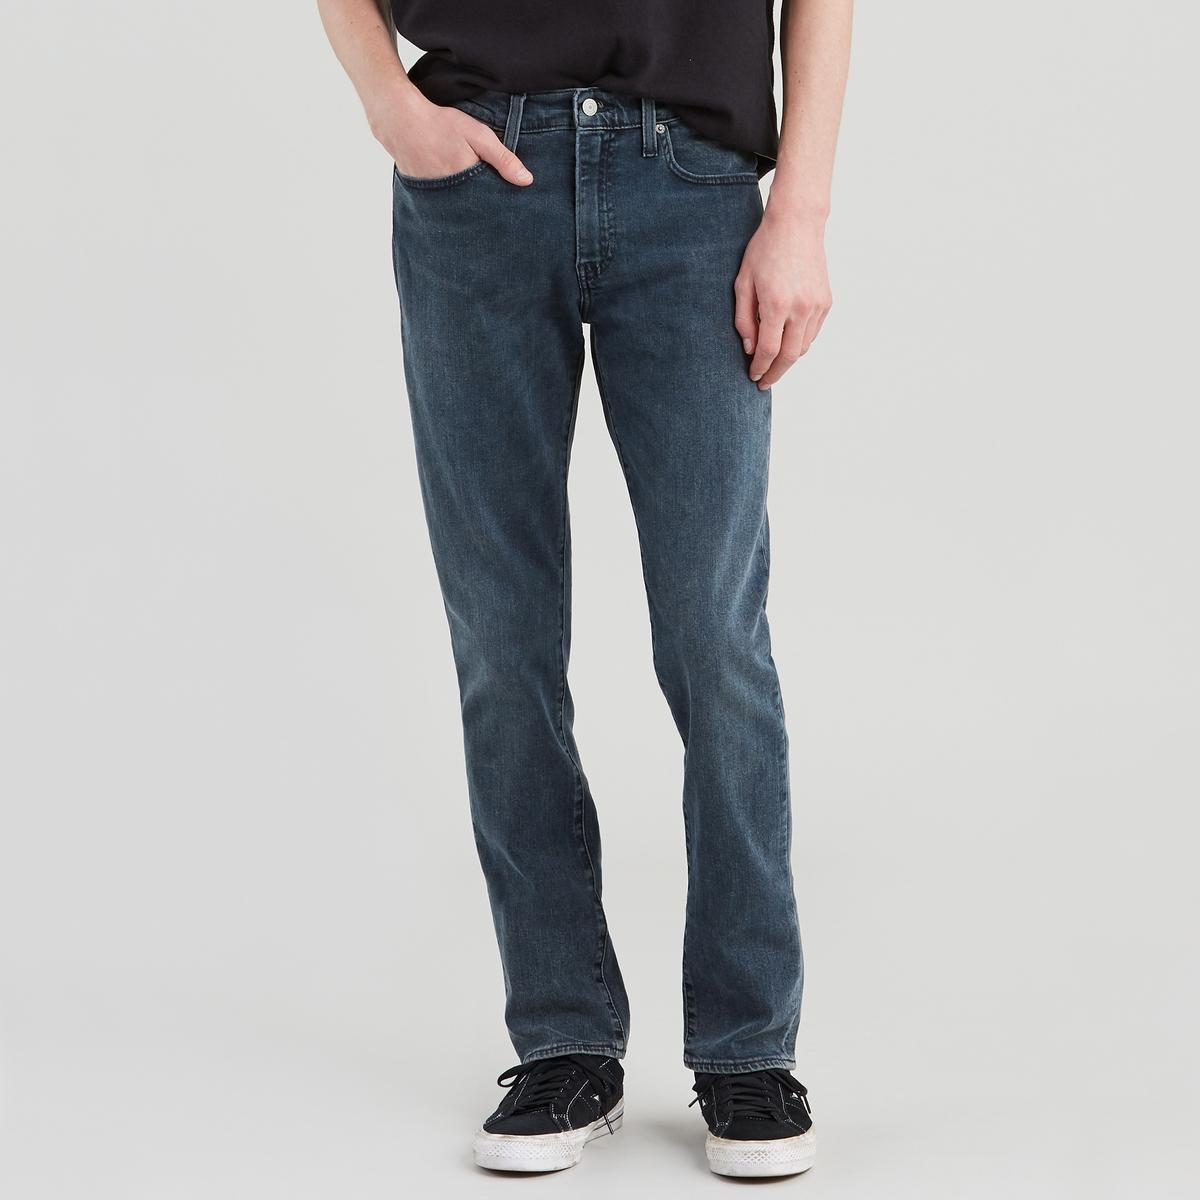 Jeans 511 taglio slim in denim stretch